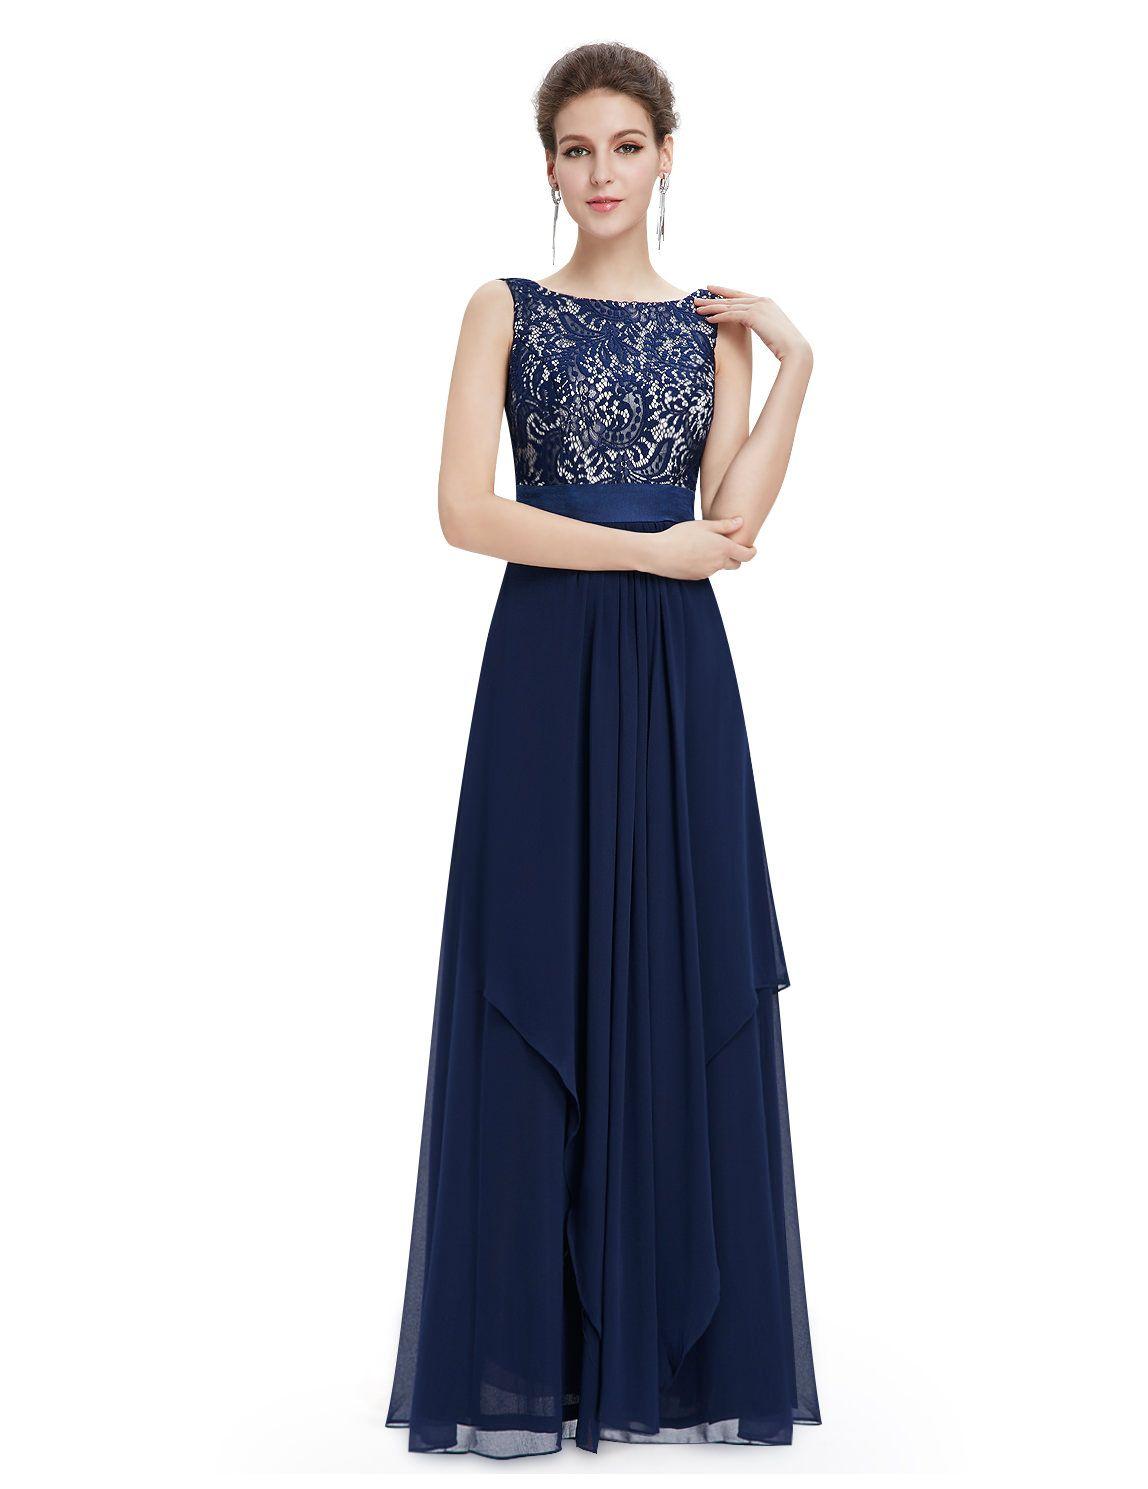 Blaues spitzen Abendkleid | kleid | Pinterest | blaue Spitzen ...